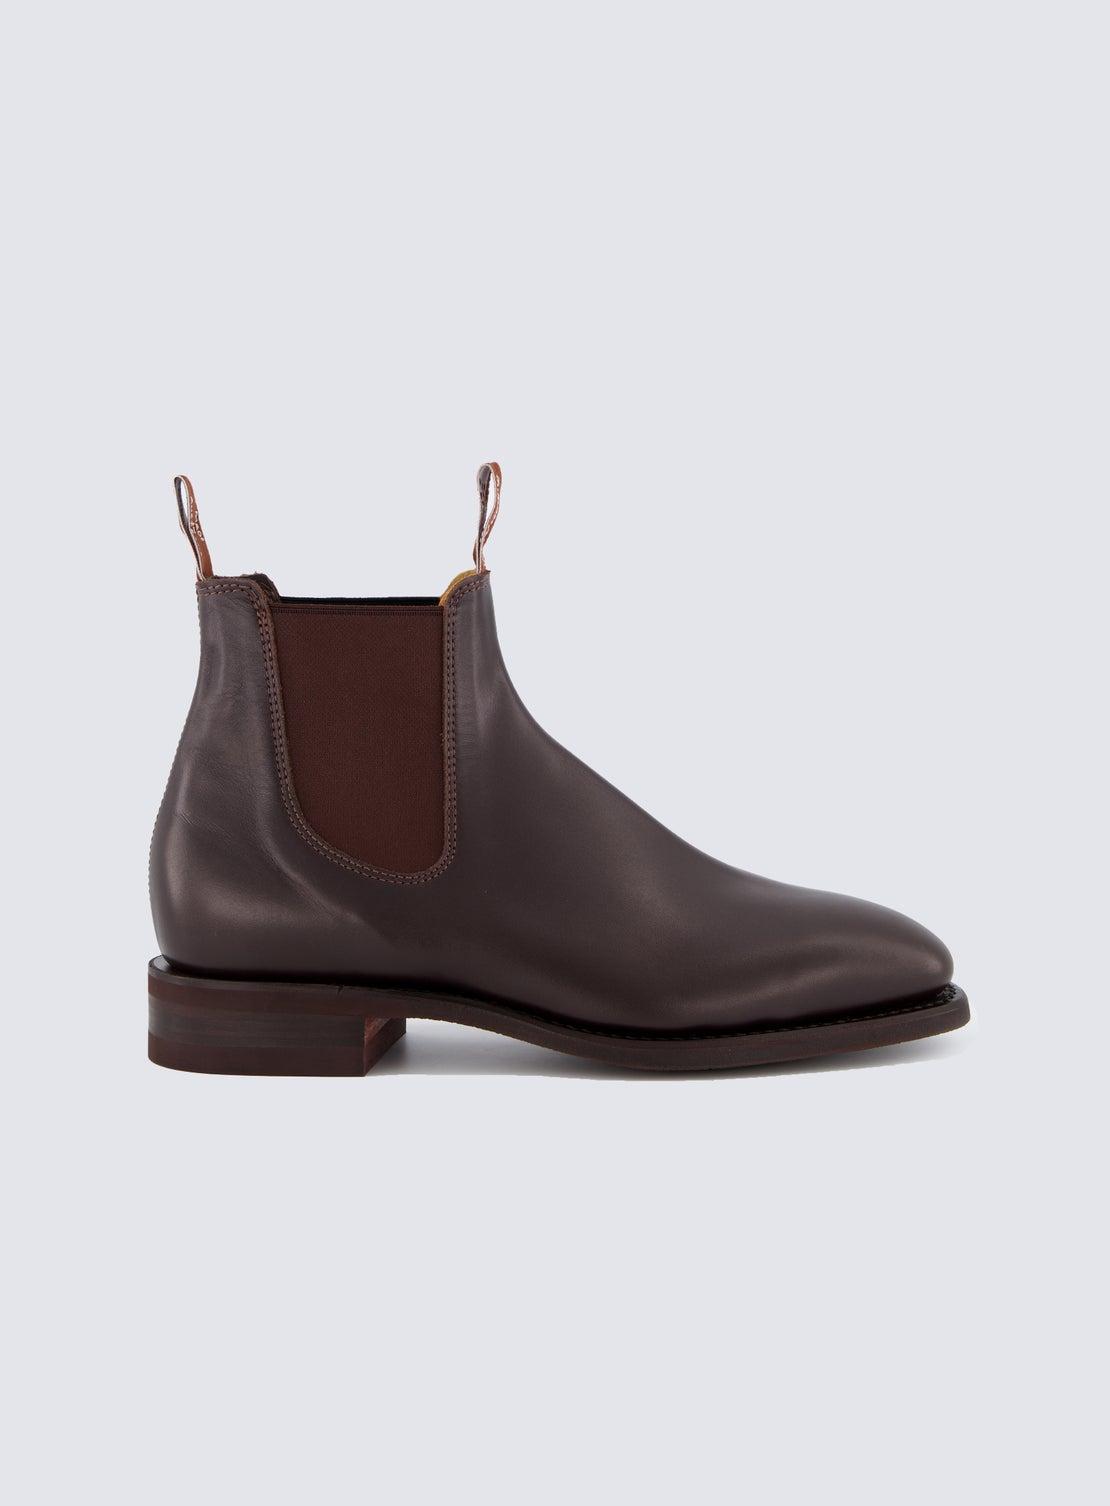 RM Williams Chestnut Comfort Craftsman Boot